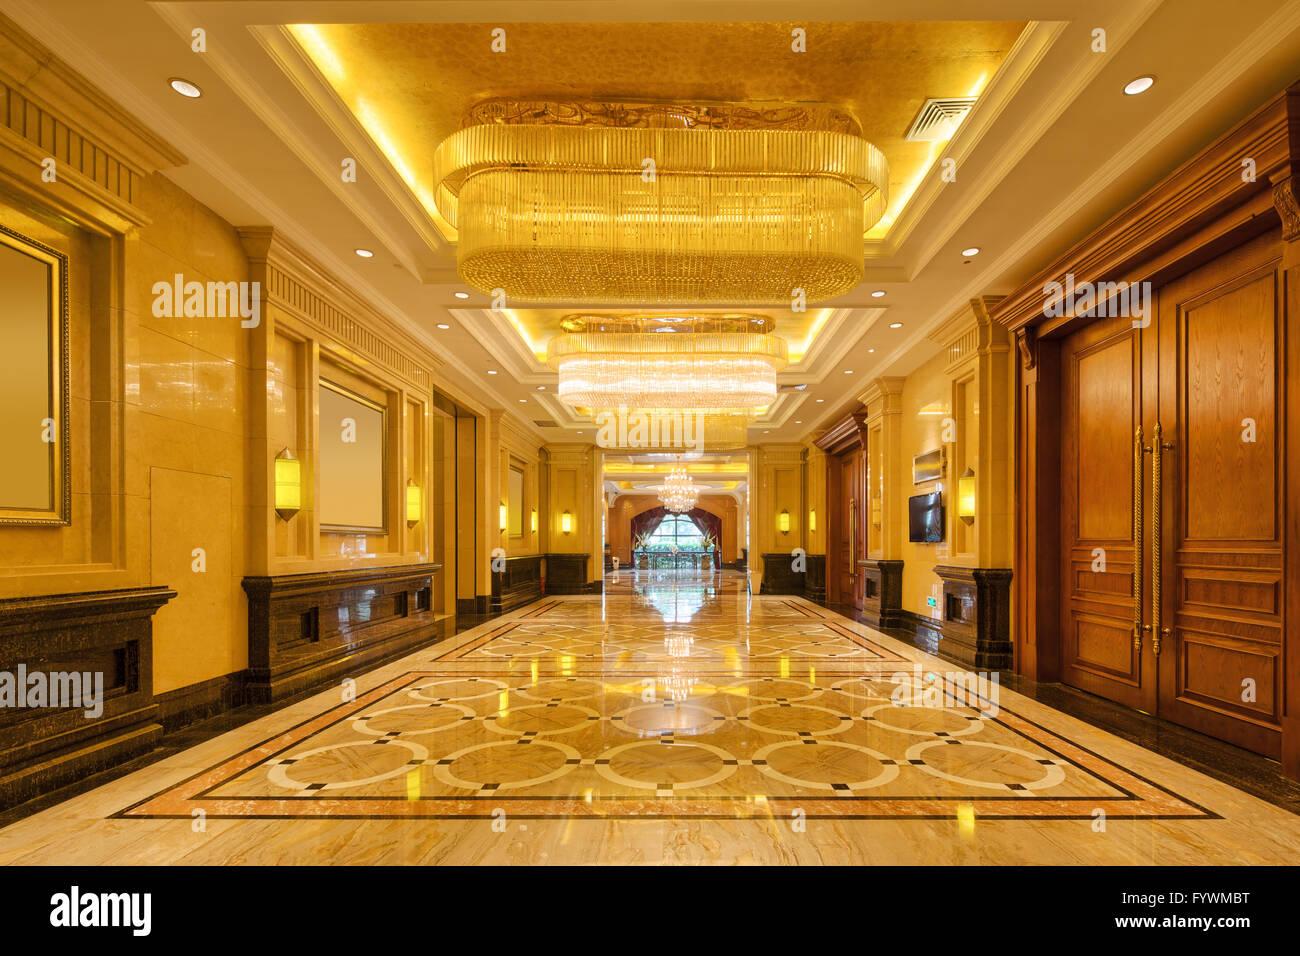 Luxury Apartment Building Entrance Stock Photos  Luxury